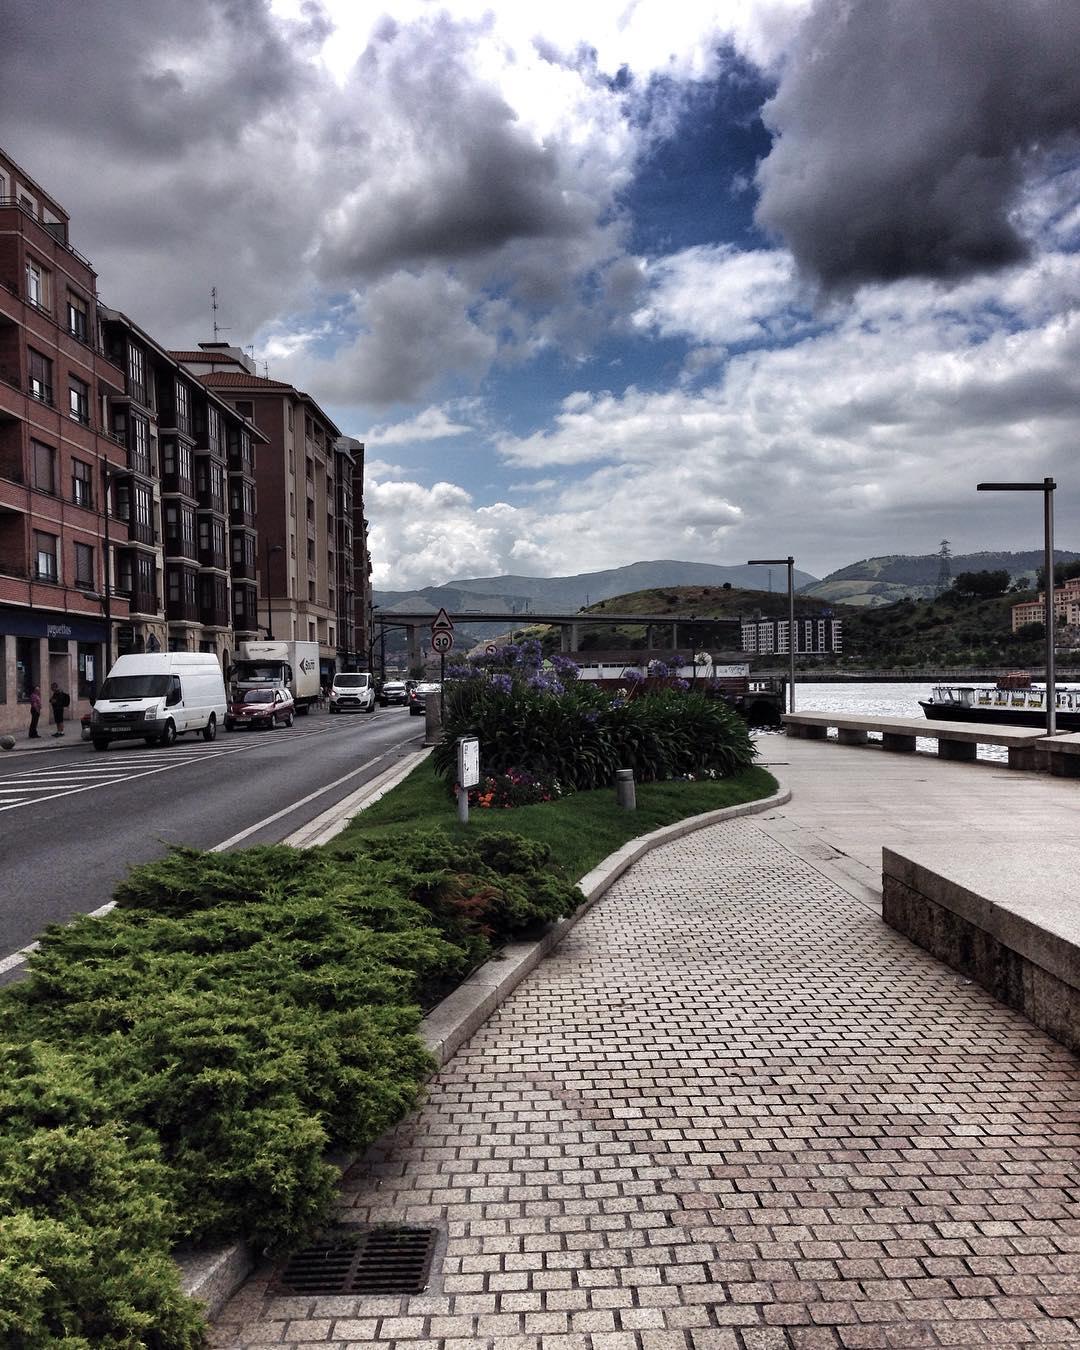 1468497264 - Verano en Euskadi, Erandio - Verano En Euskadi, Erandio